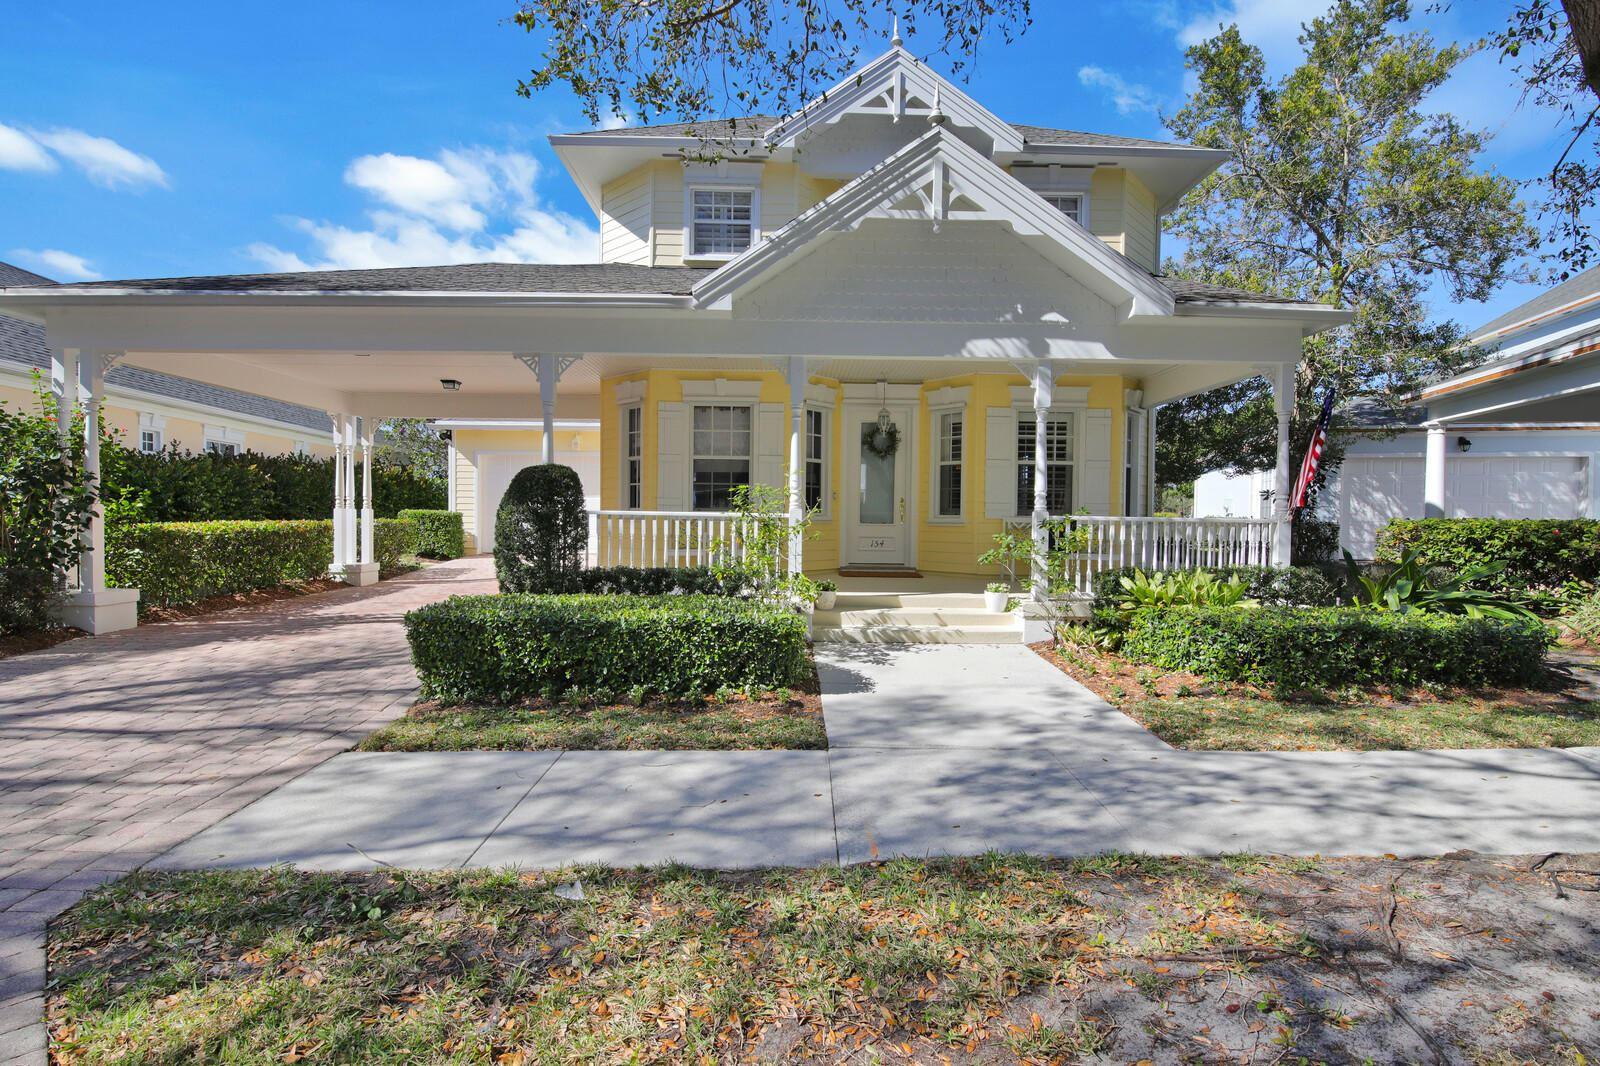 Photo of 154 Barbados Drive, Jupiter, FL 33458 (MLS # RX-10690926)